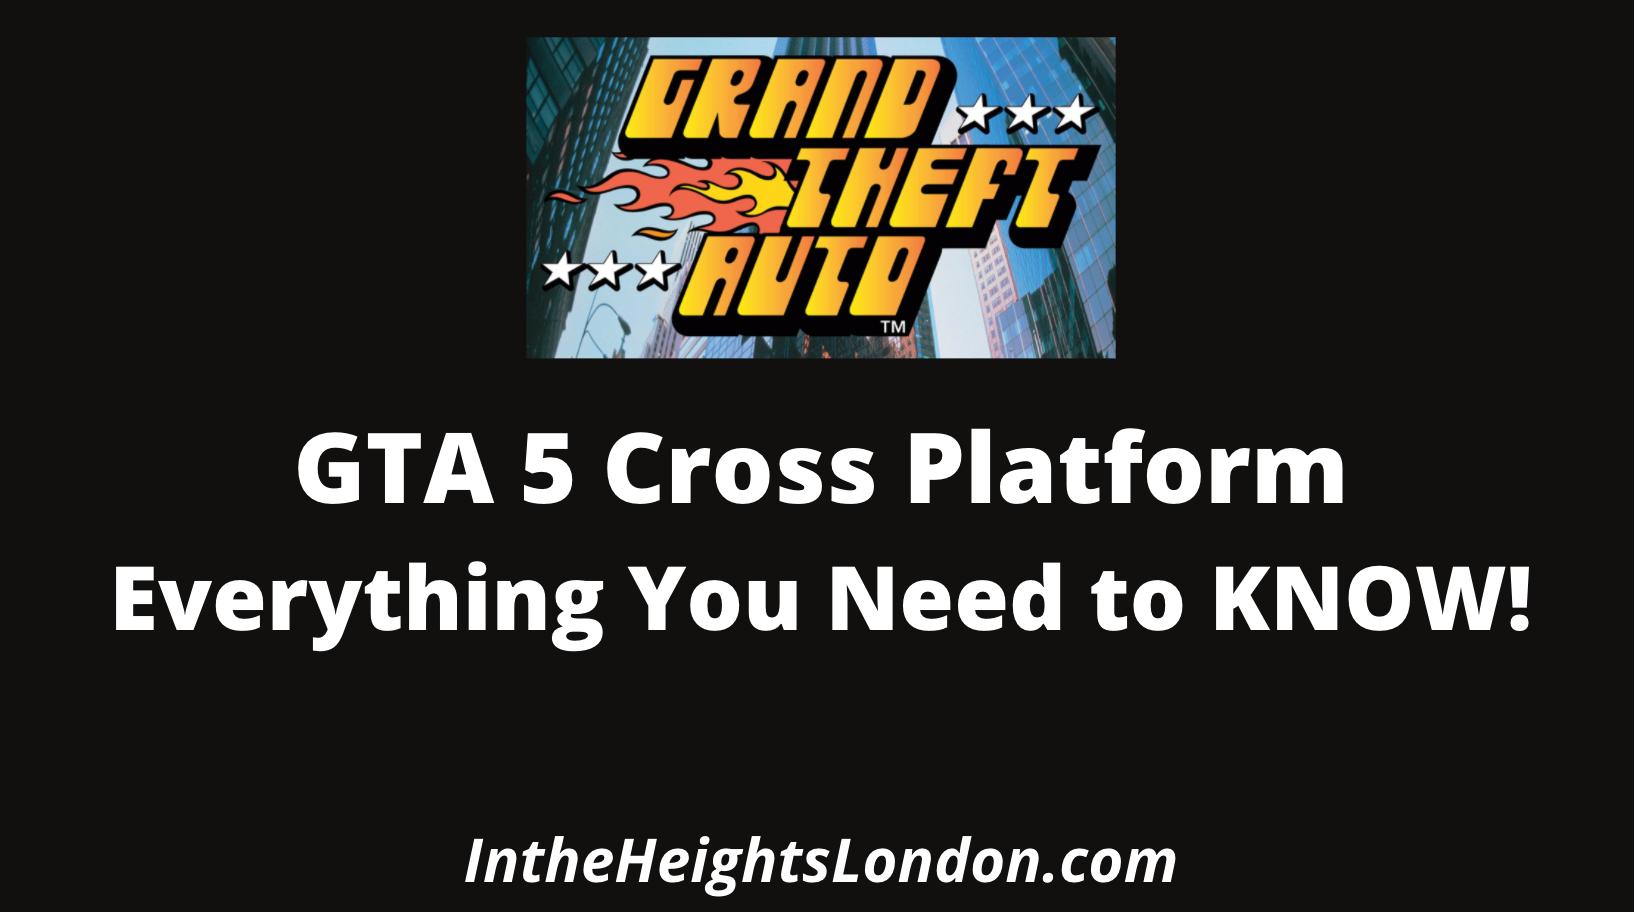 GTA 5 Cross Platform